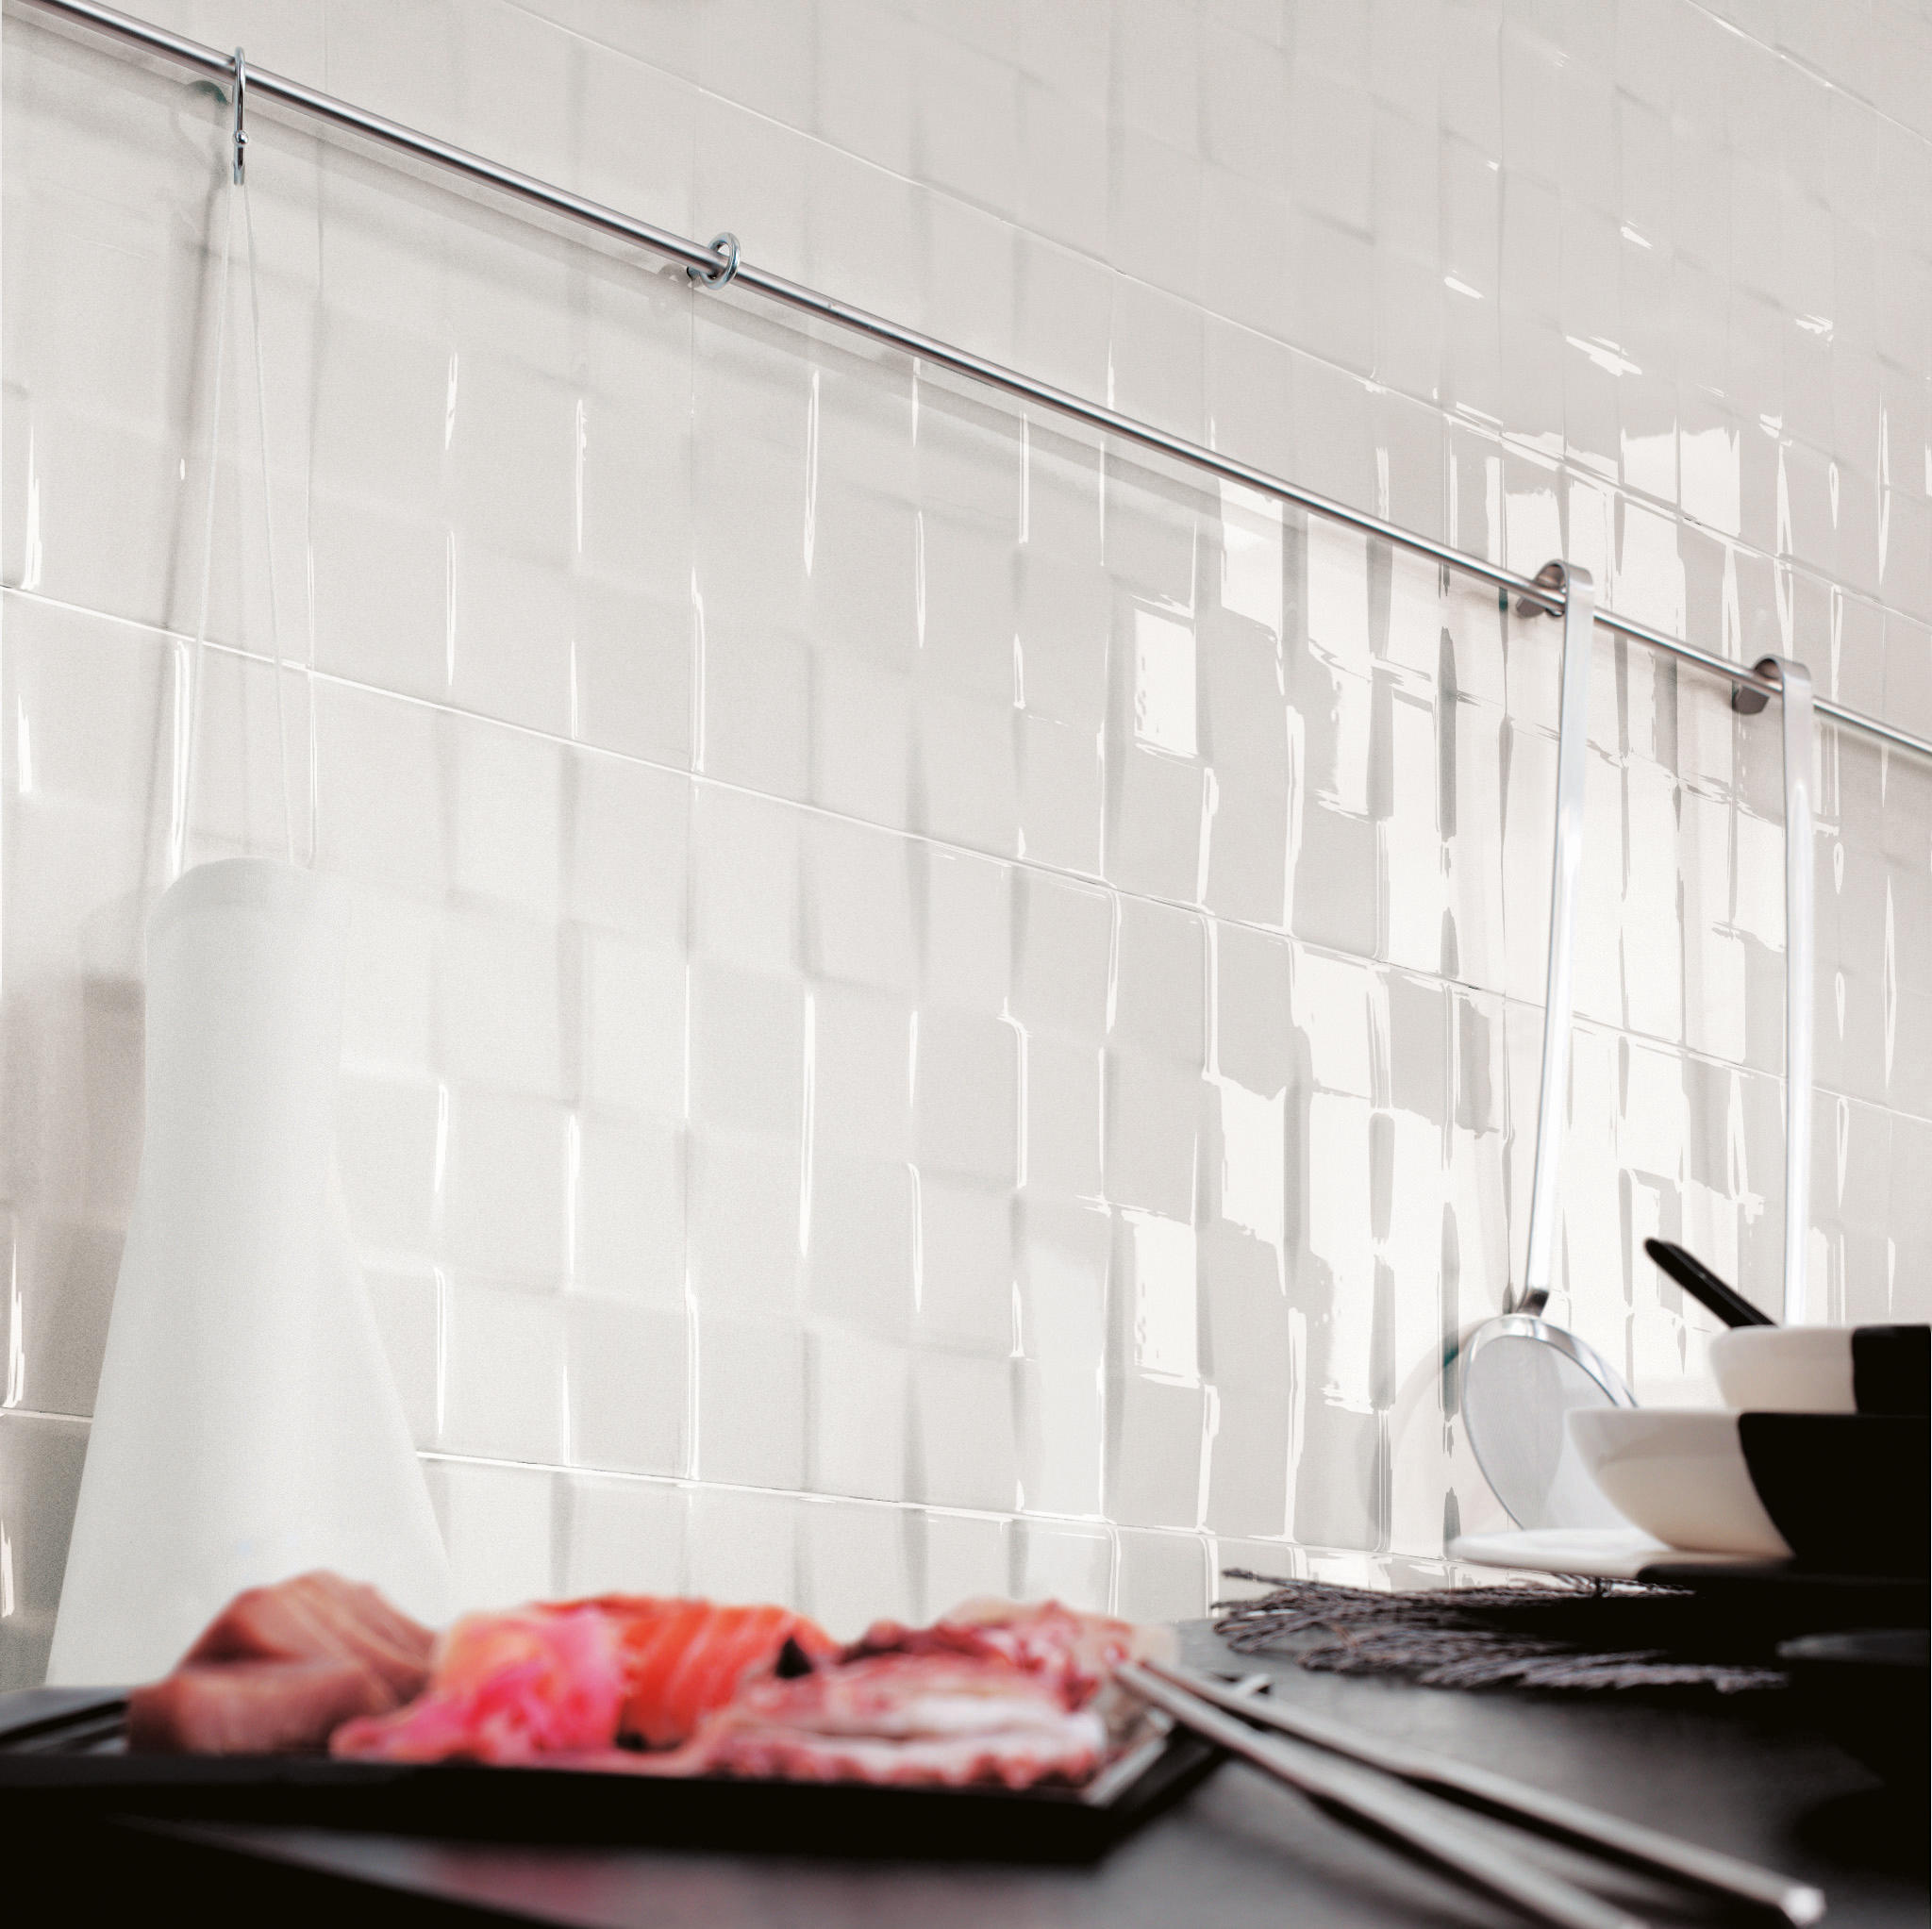 lumina frame white matt 20x20 wall tiles by fap. Black Bedroom Furniture Sets. Home Design Ideas